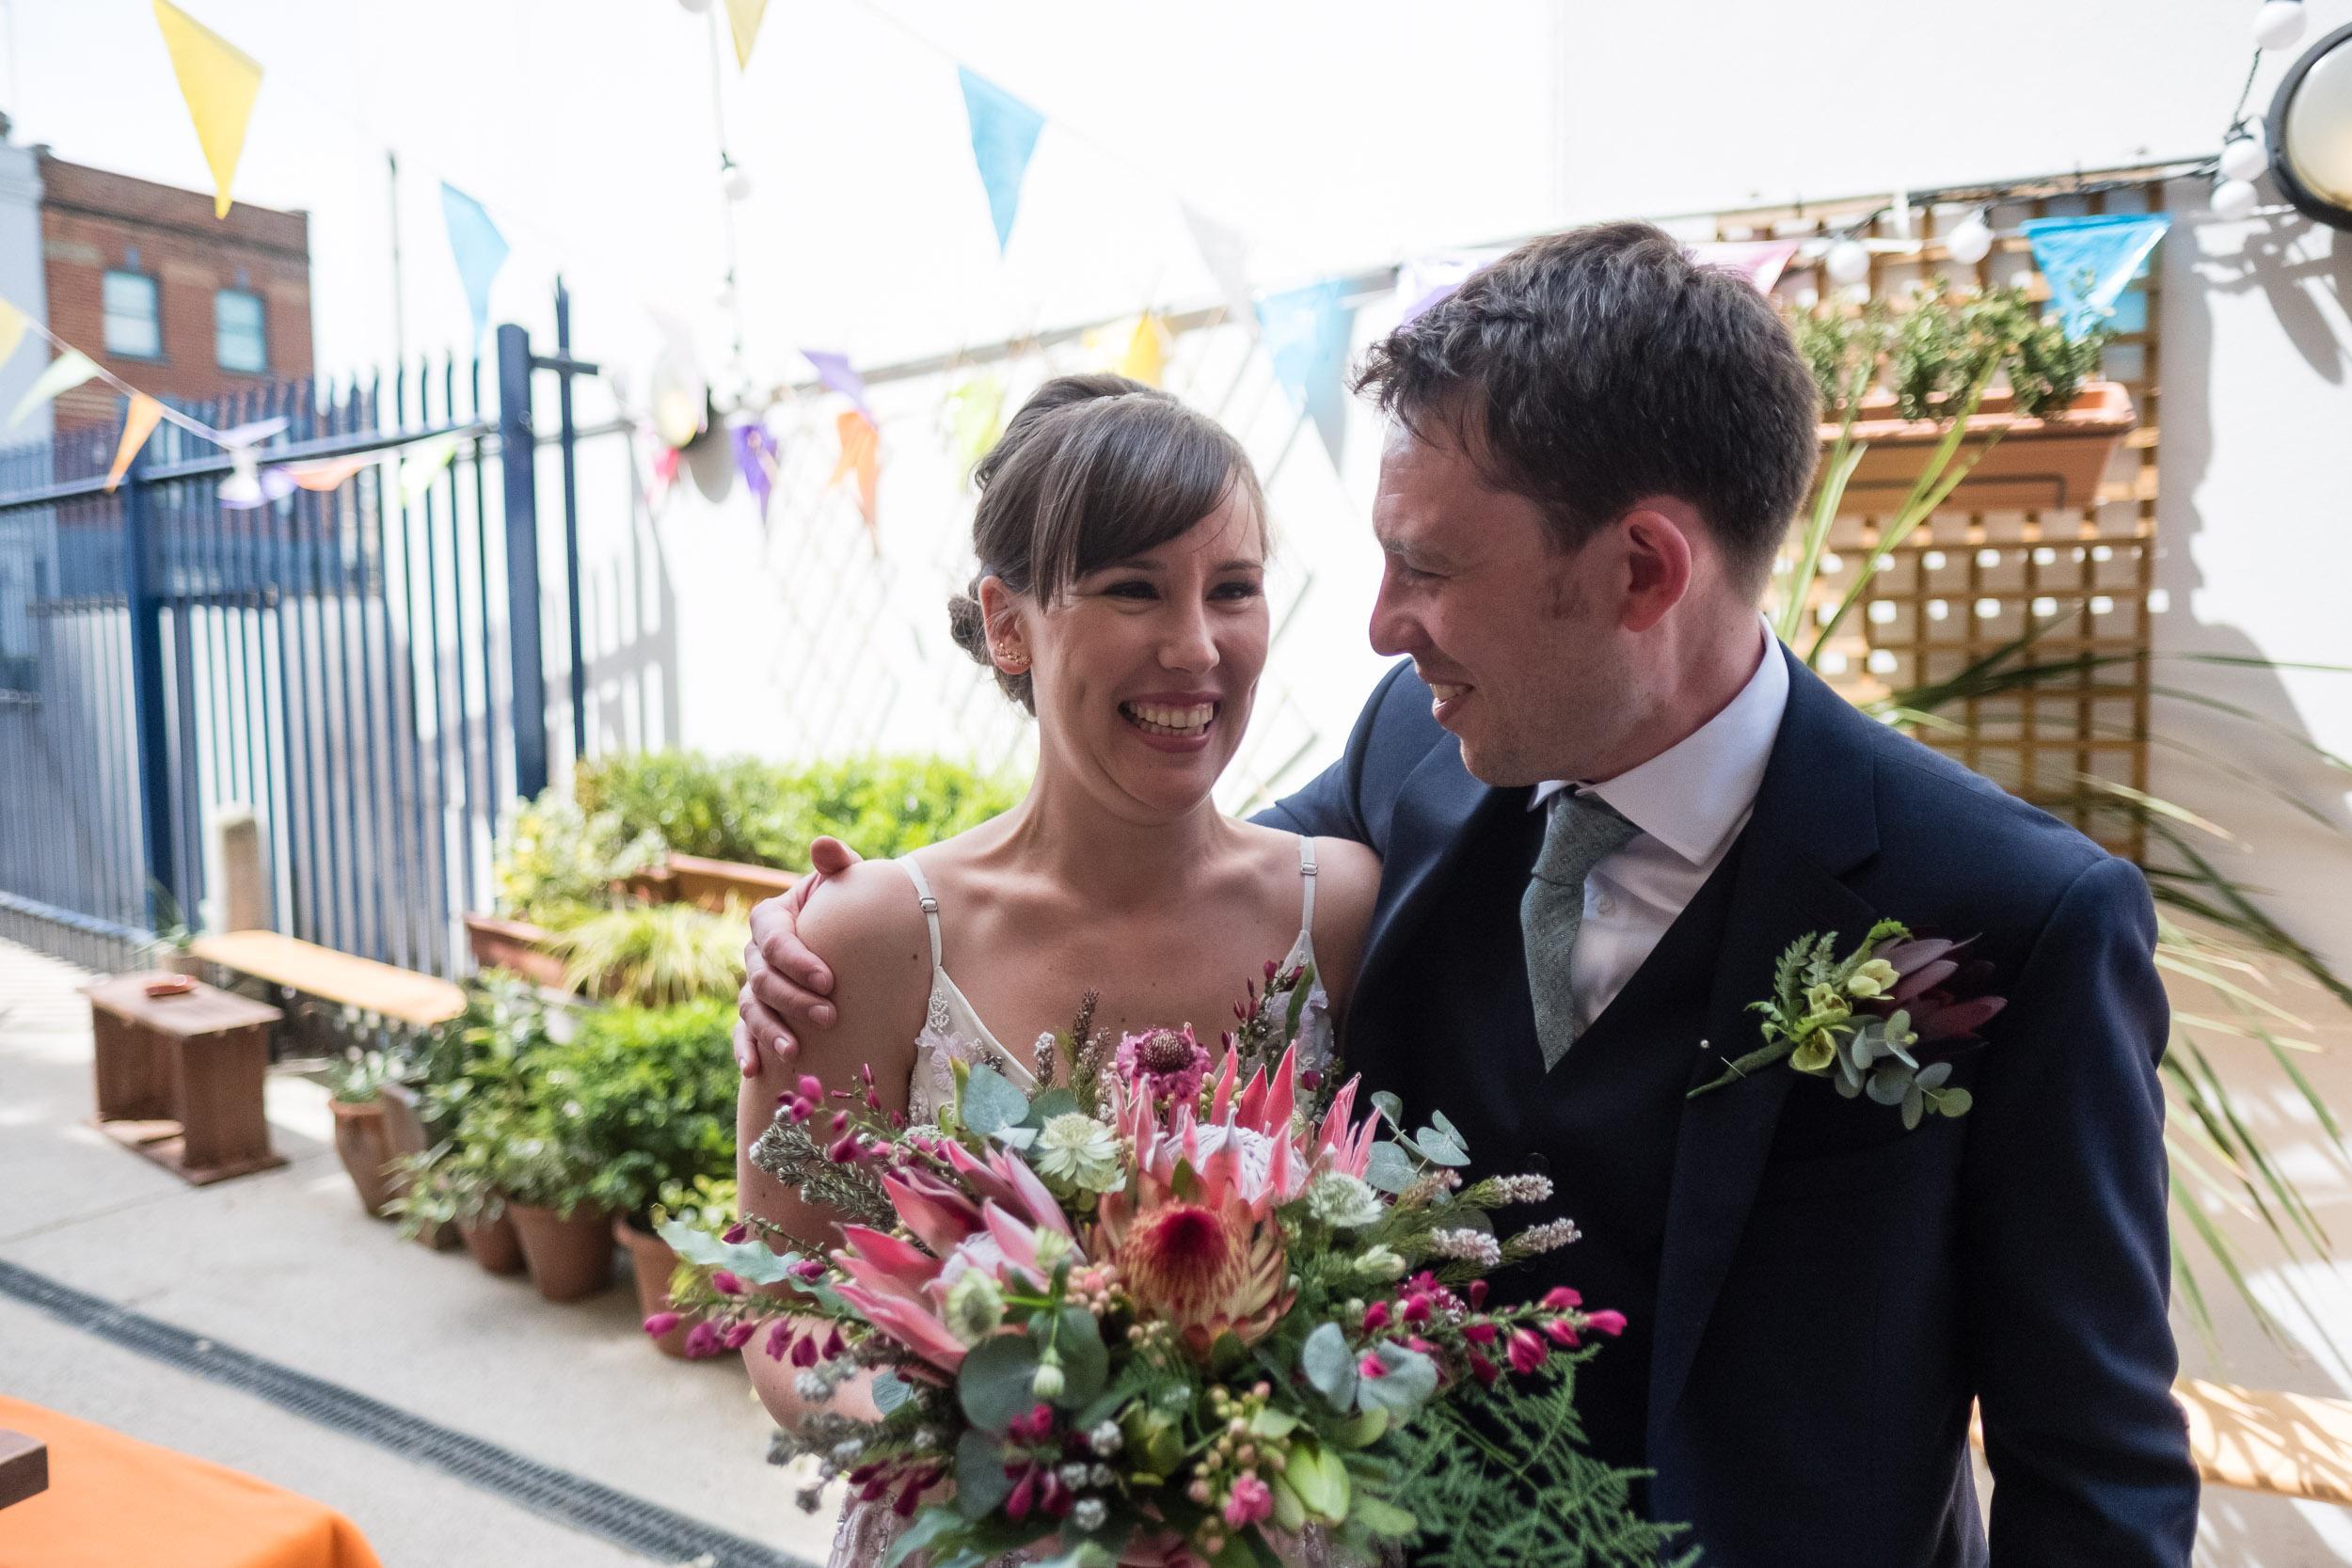 brockwell-lido-brixton-herne-hill-wedding-050.jpg